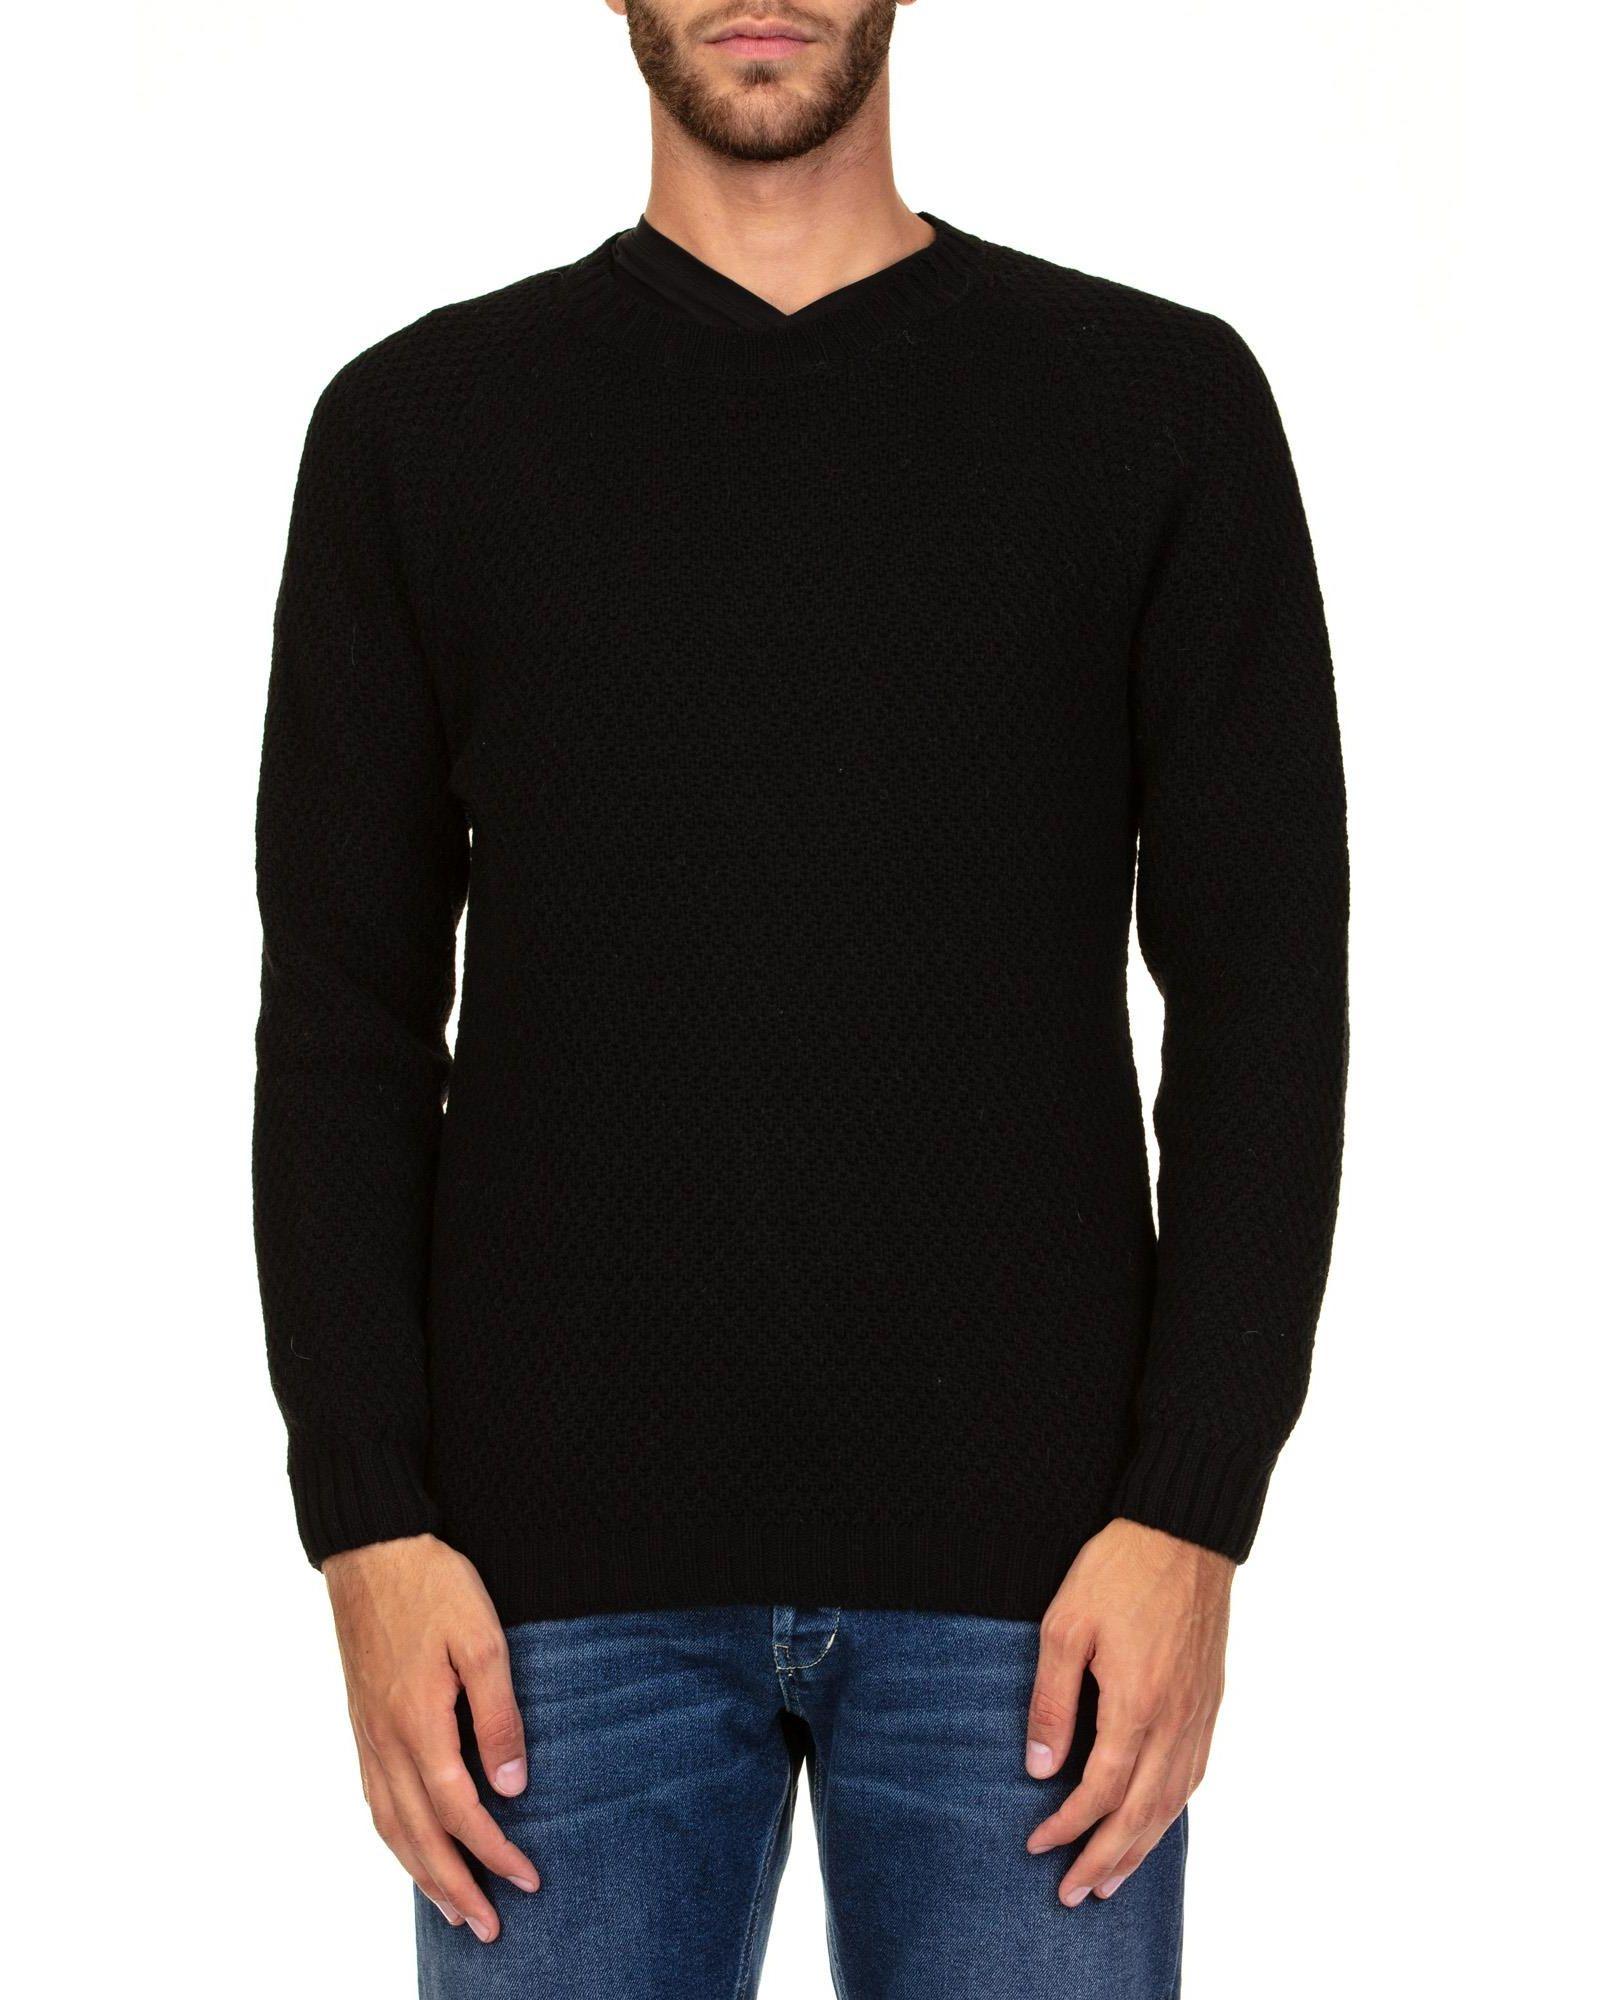 DANIELE FIESOLI Baby Alpaca And Merino Wool Sweater in Black